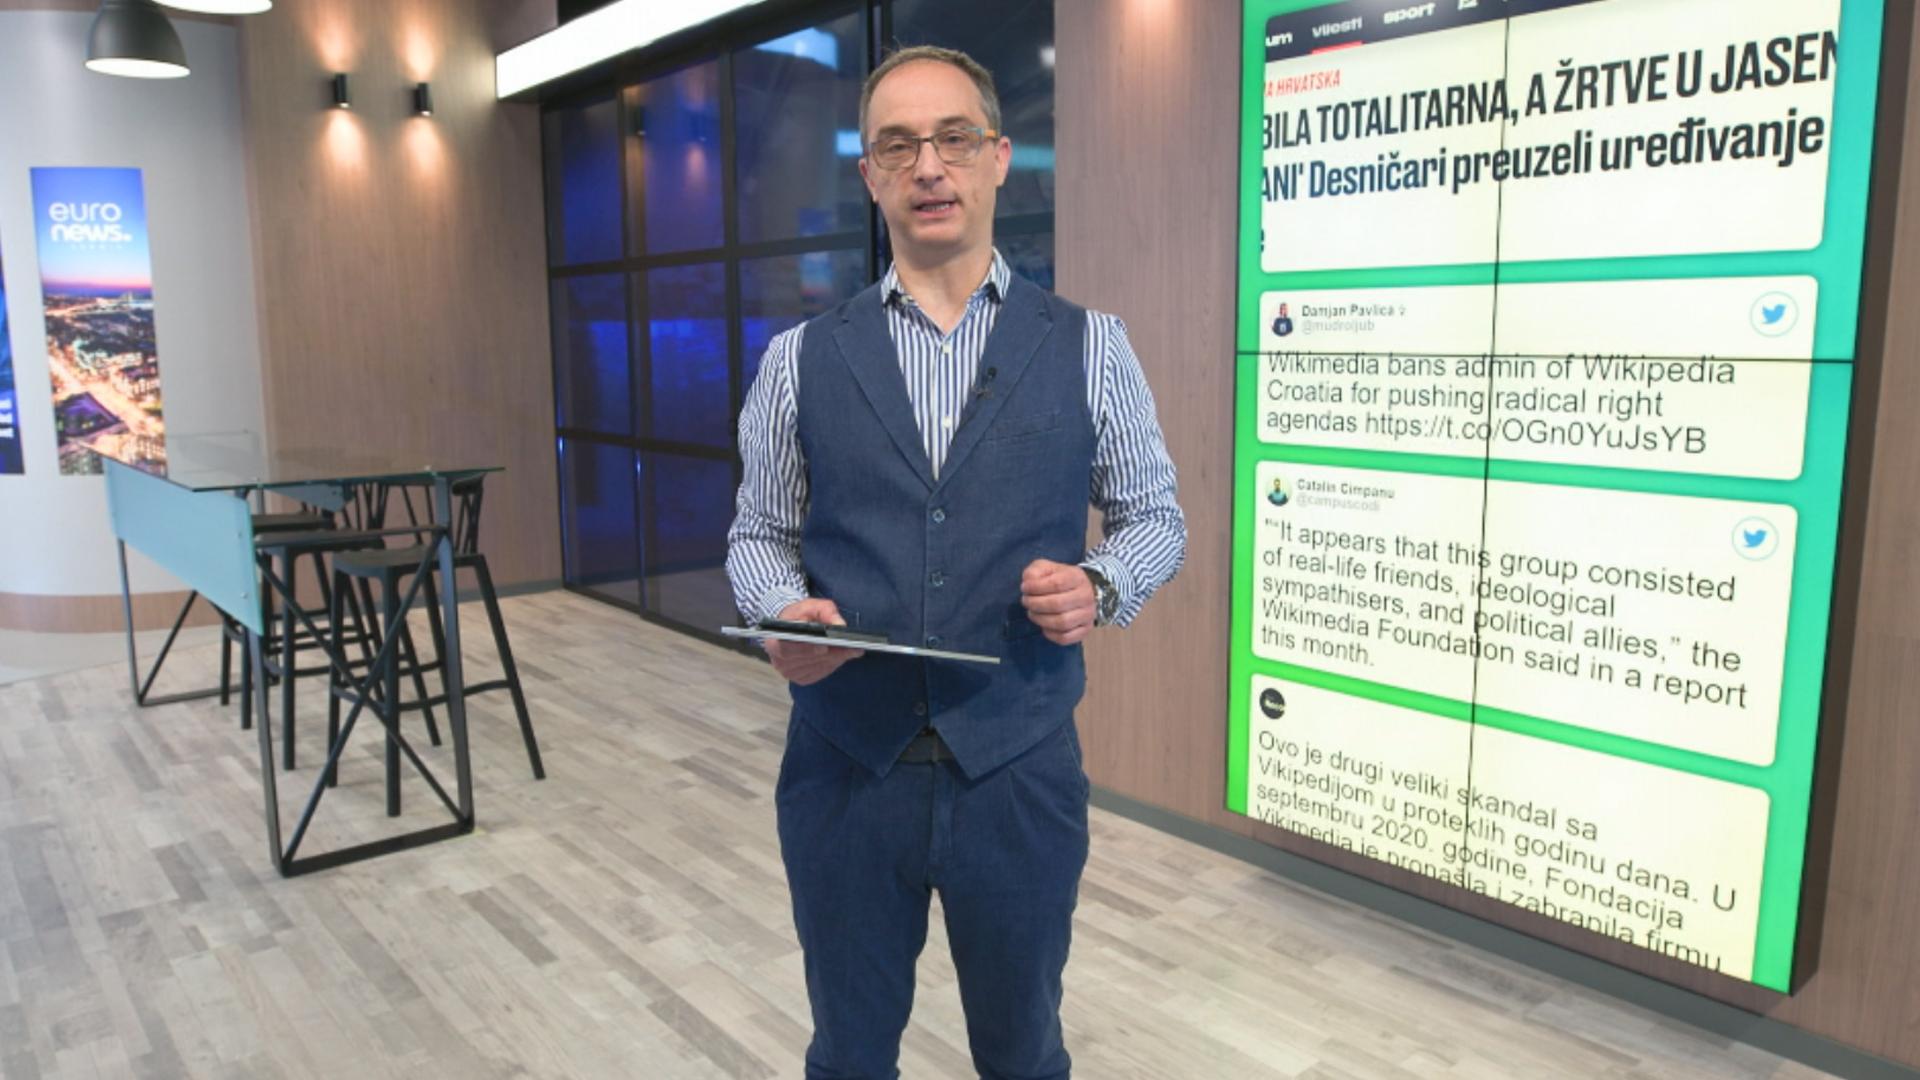 Kocka • Euronews 22.jun